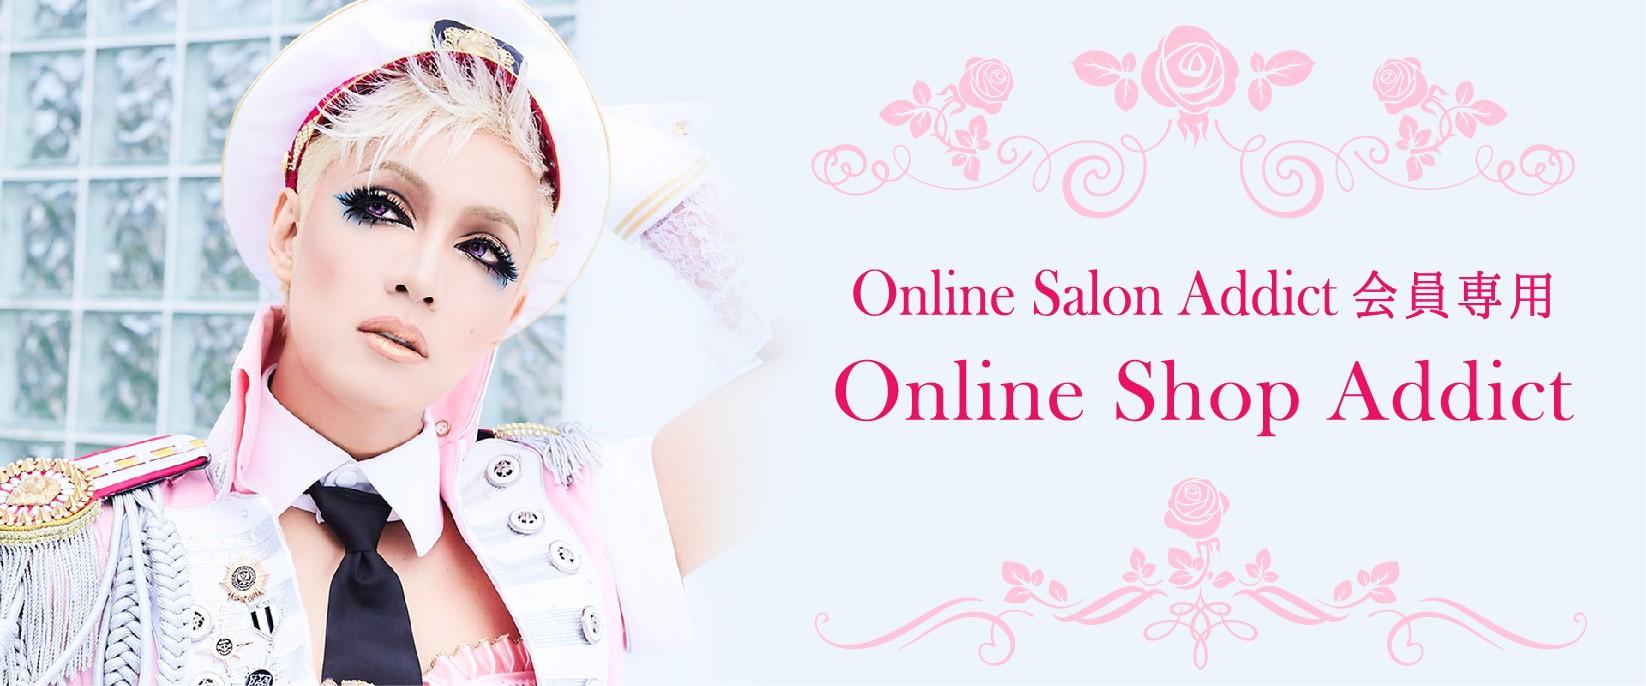 Online Shop Addict